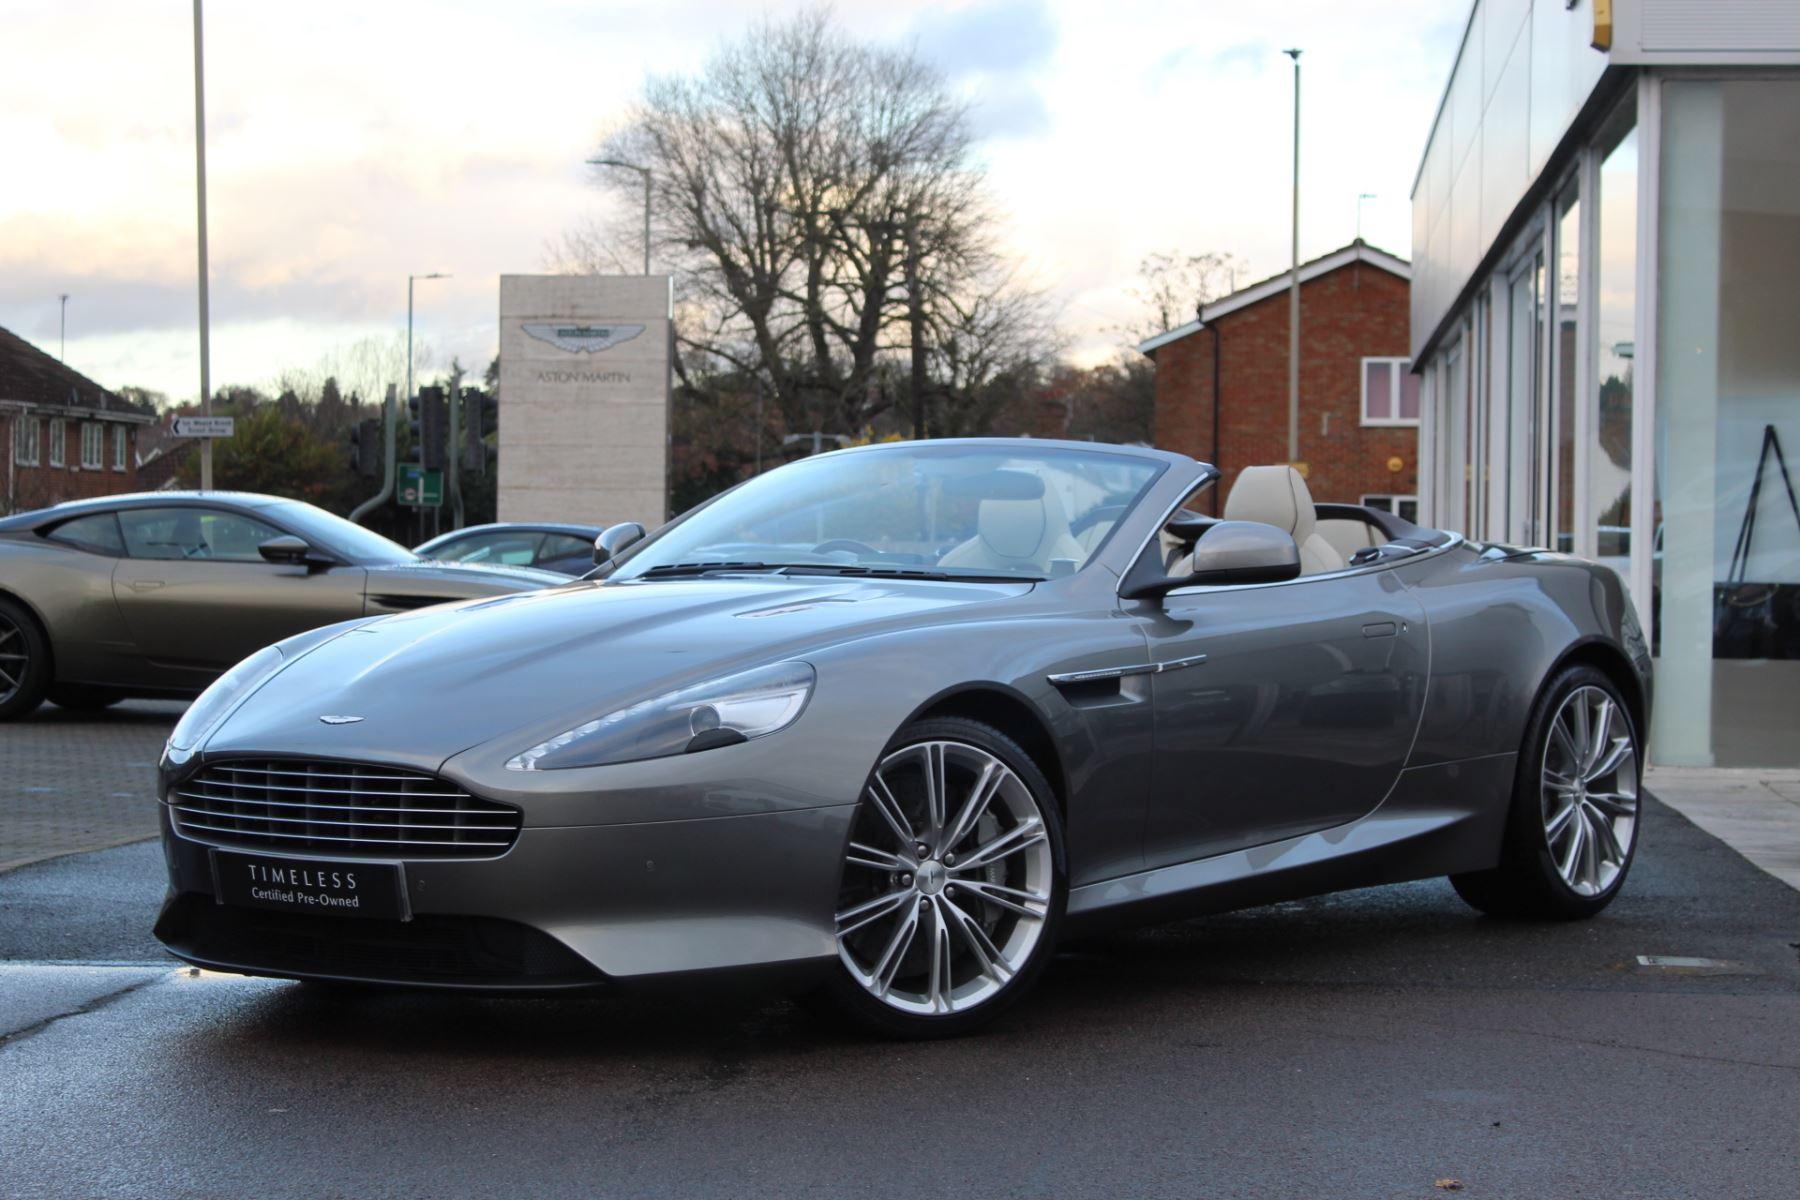 Aston Martin Virage V12 2dr Volante Touchtronic 5.9  Automatic Convertible (2011) image